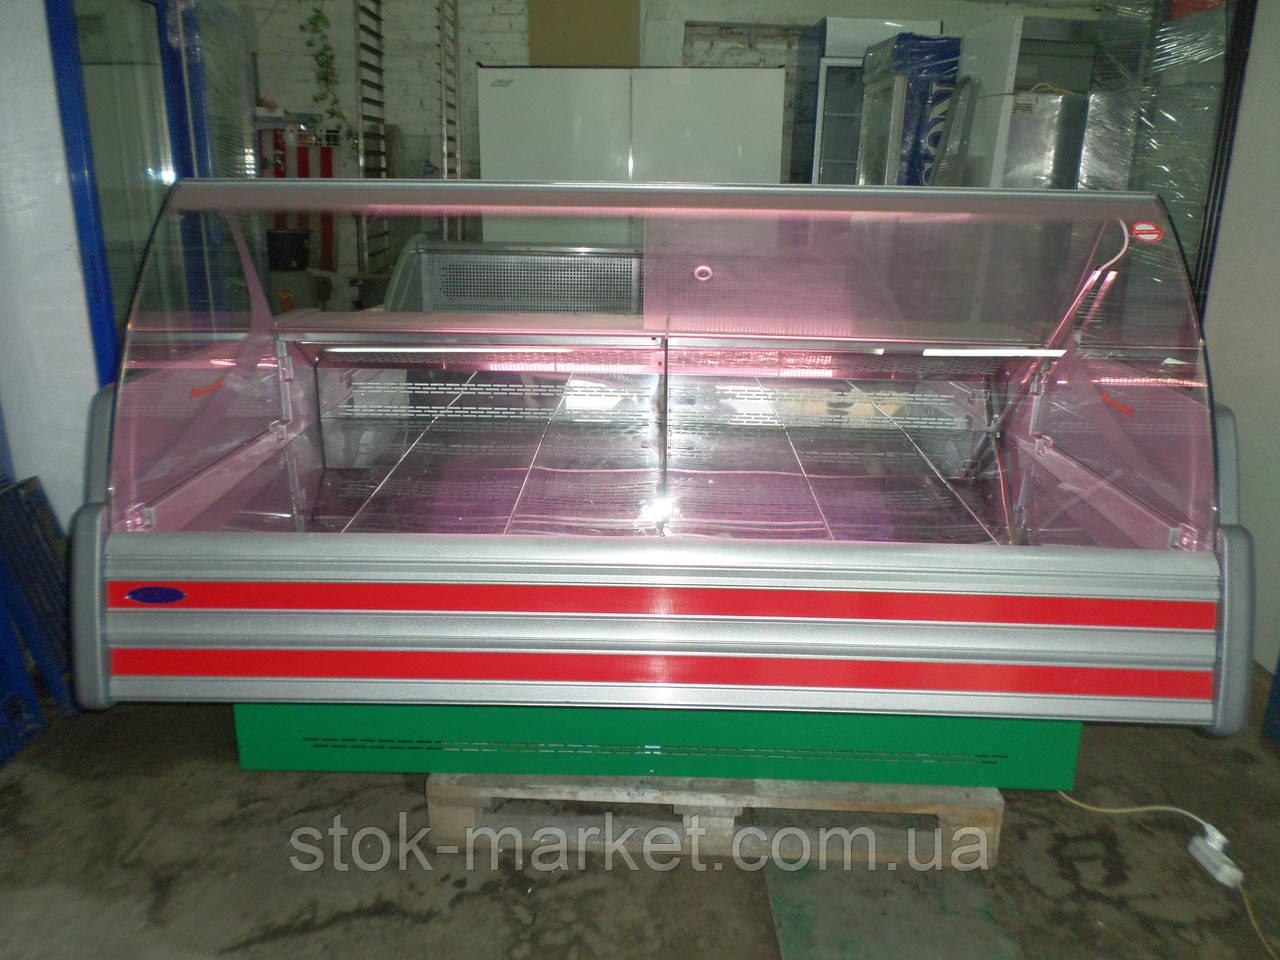 прилавок холодильник б/у цена